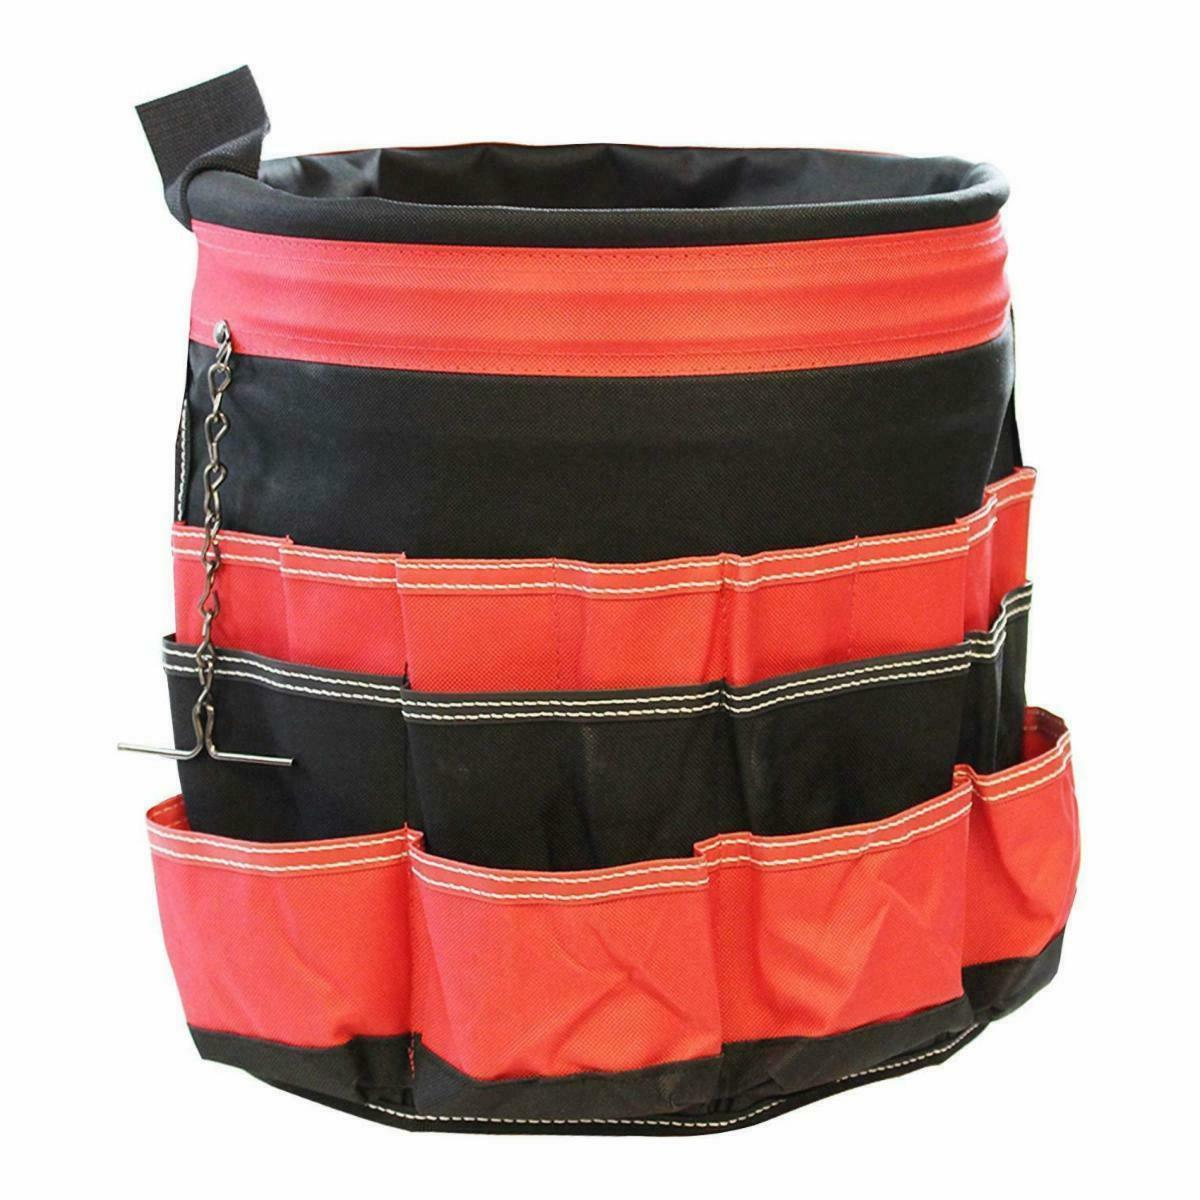 Blackthorn Bucket Organizer Tote Pockets